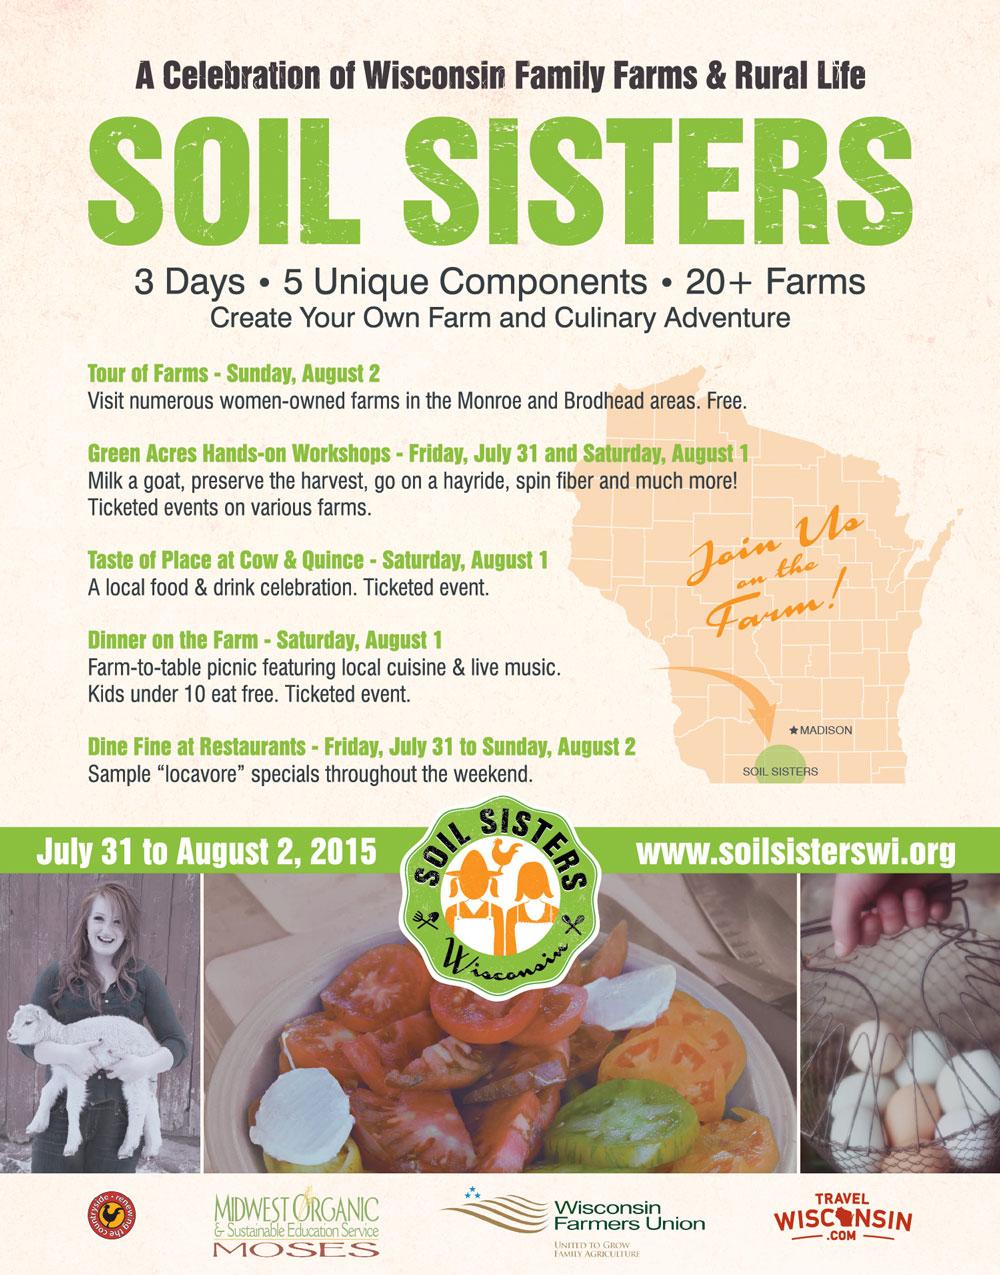 Soil Sisters: July 31-Aug. 2, 2015 in Wisconsin